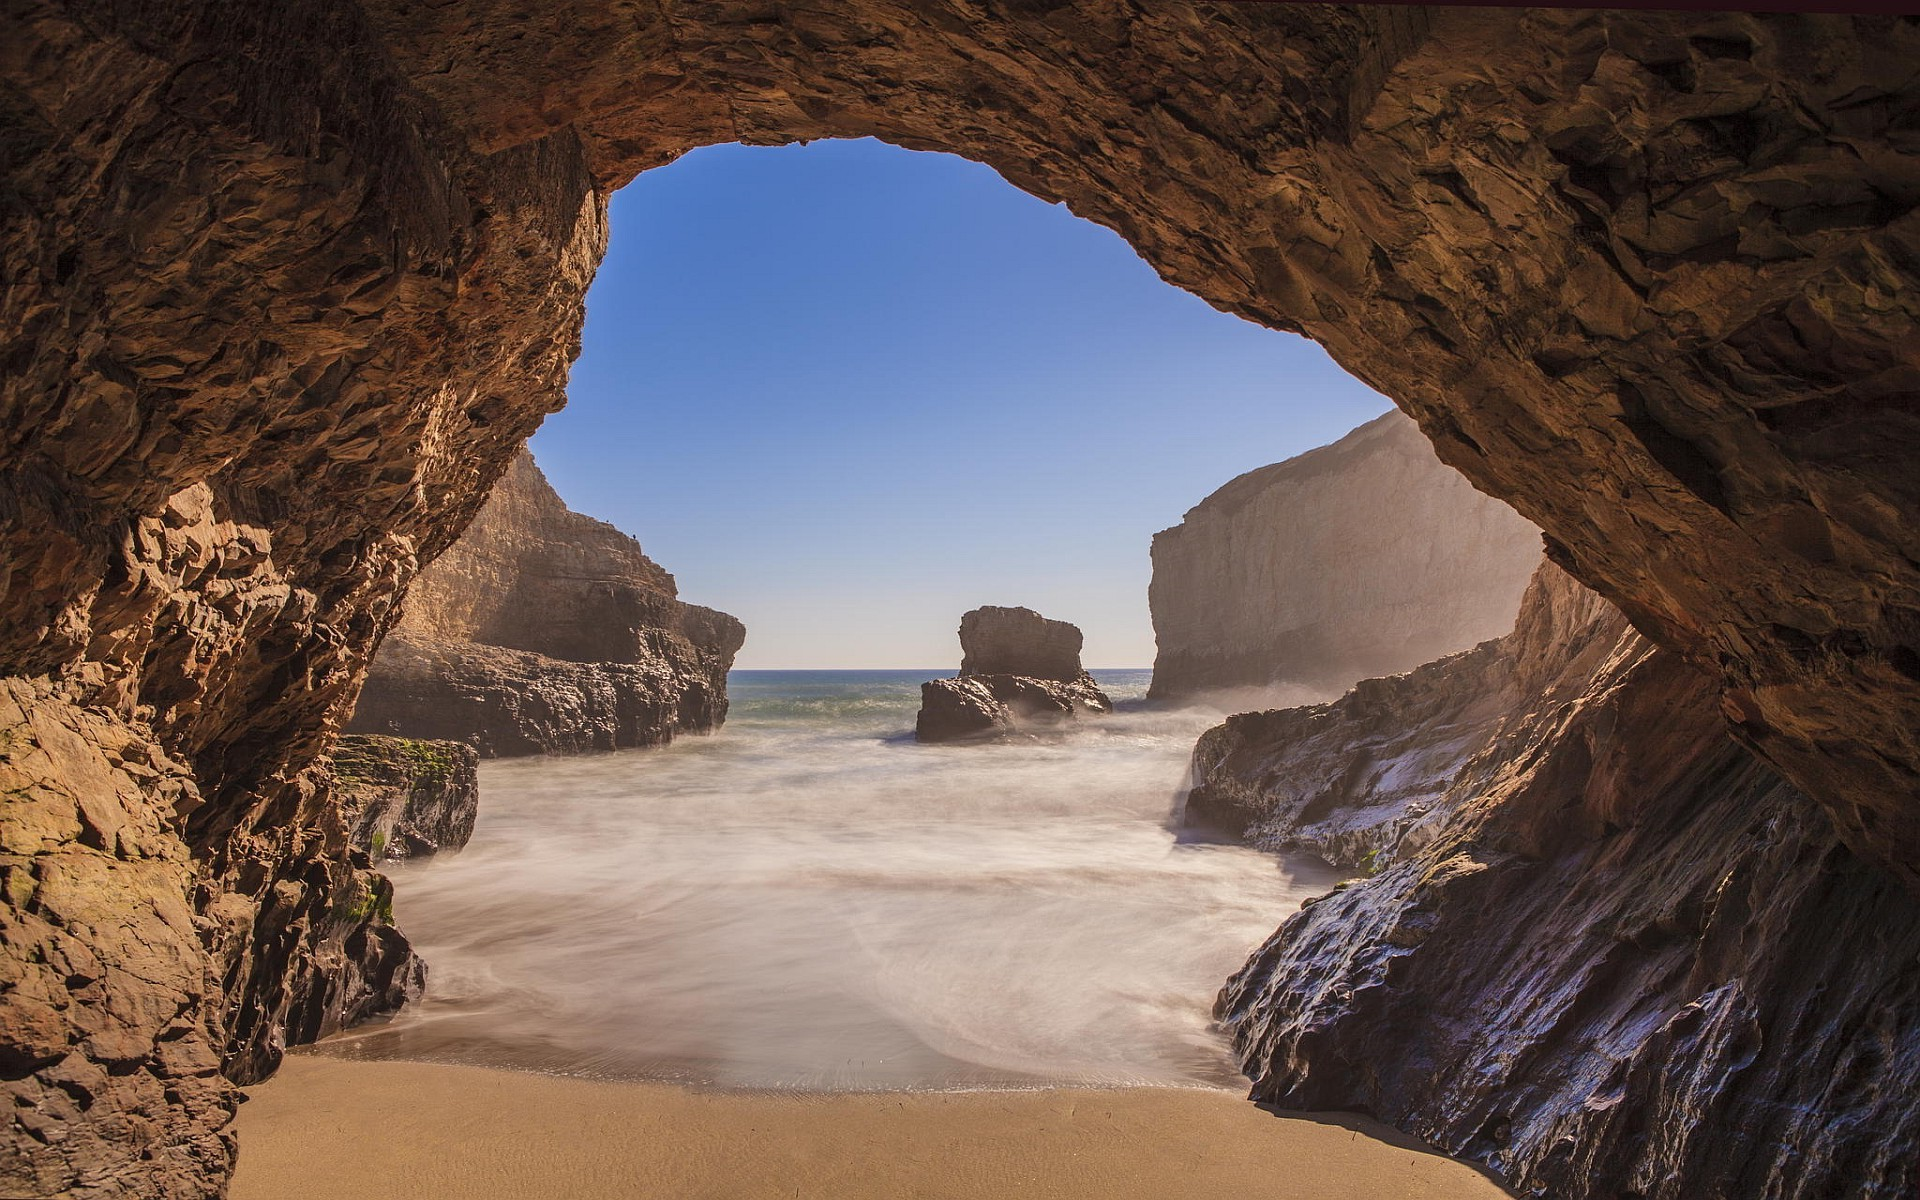 caves wallpaper widescreen 62 images